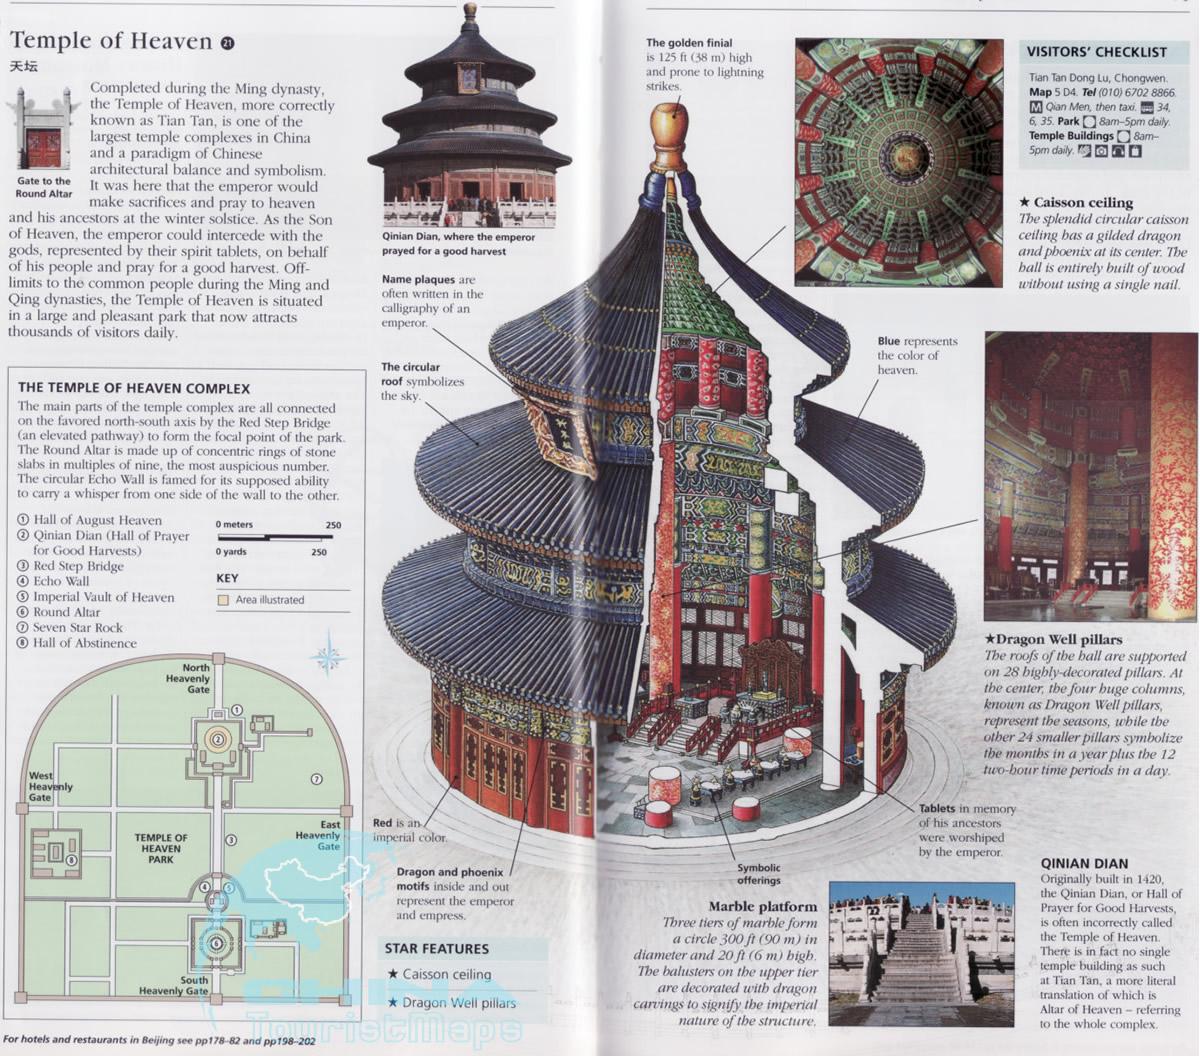 http://1.bp.blogspot.com/_-RKWUOENSNo/TK8eKRazwvI/AAAAAAAAC7I/vvzqTwVXrGE/s1600/temple-of-heaven+(1).jpg